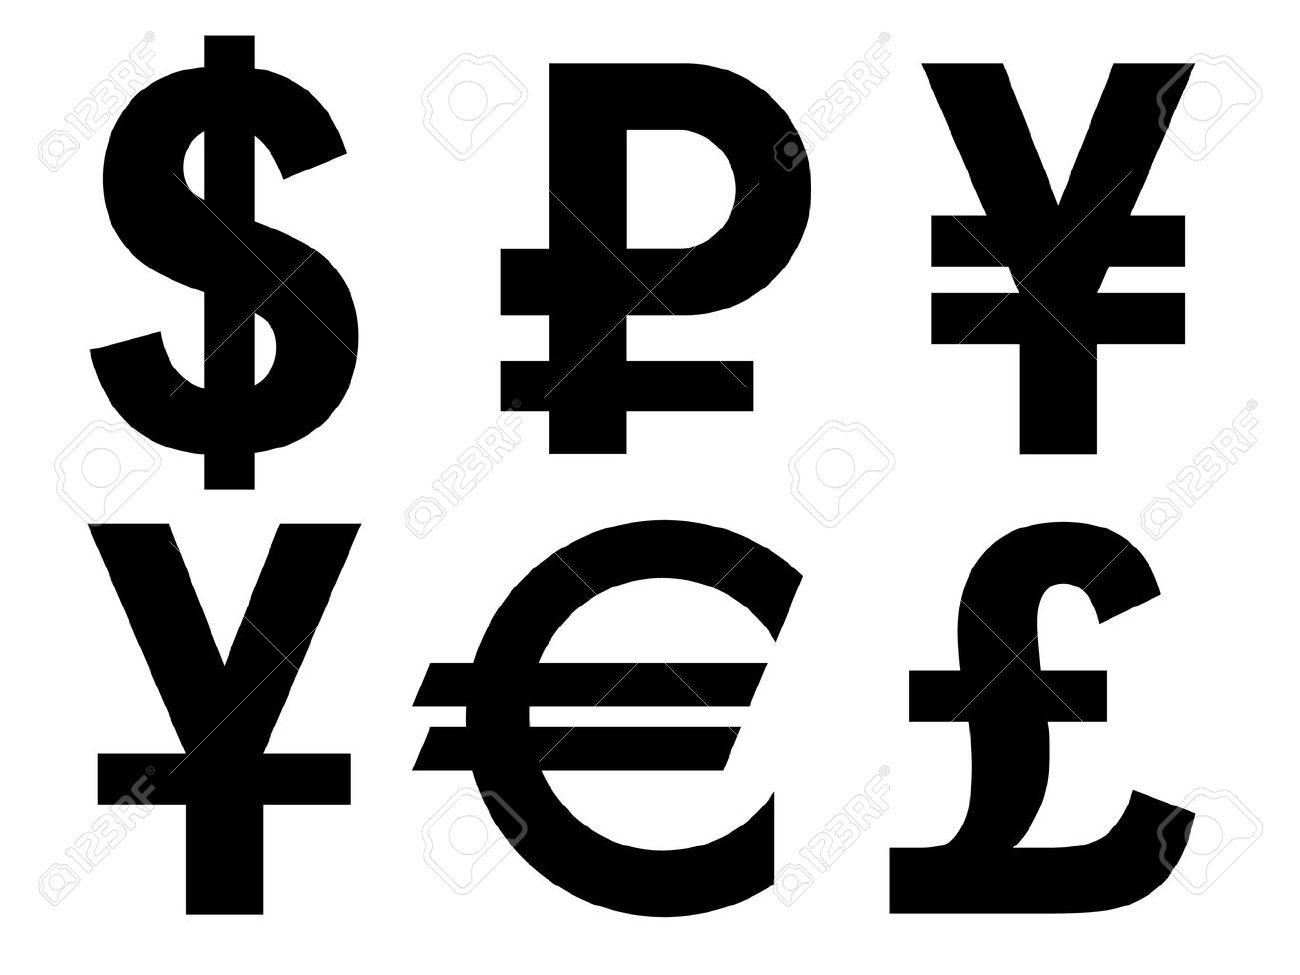 Curency Symbols Ukrandiffusion